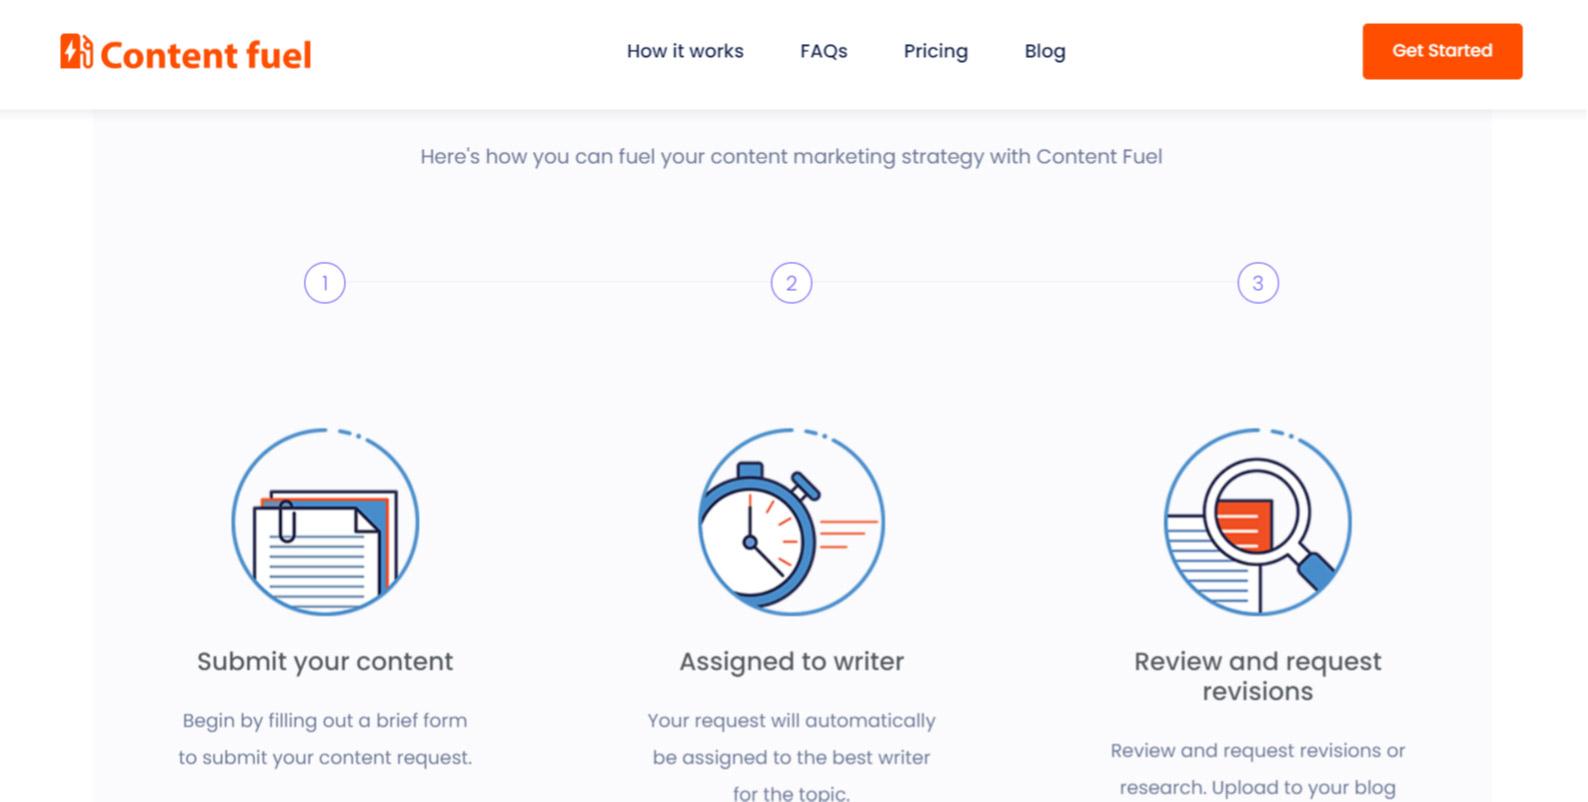 contentfuel.co